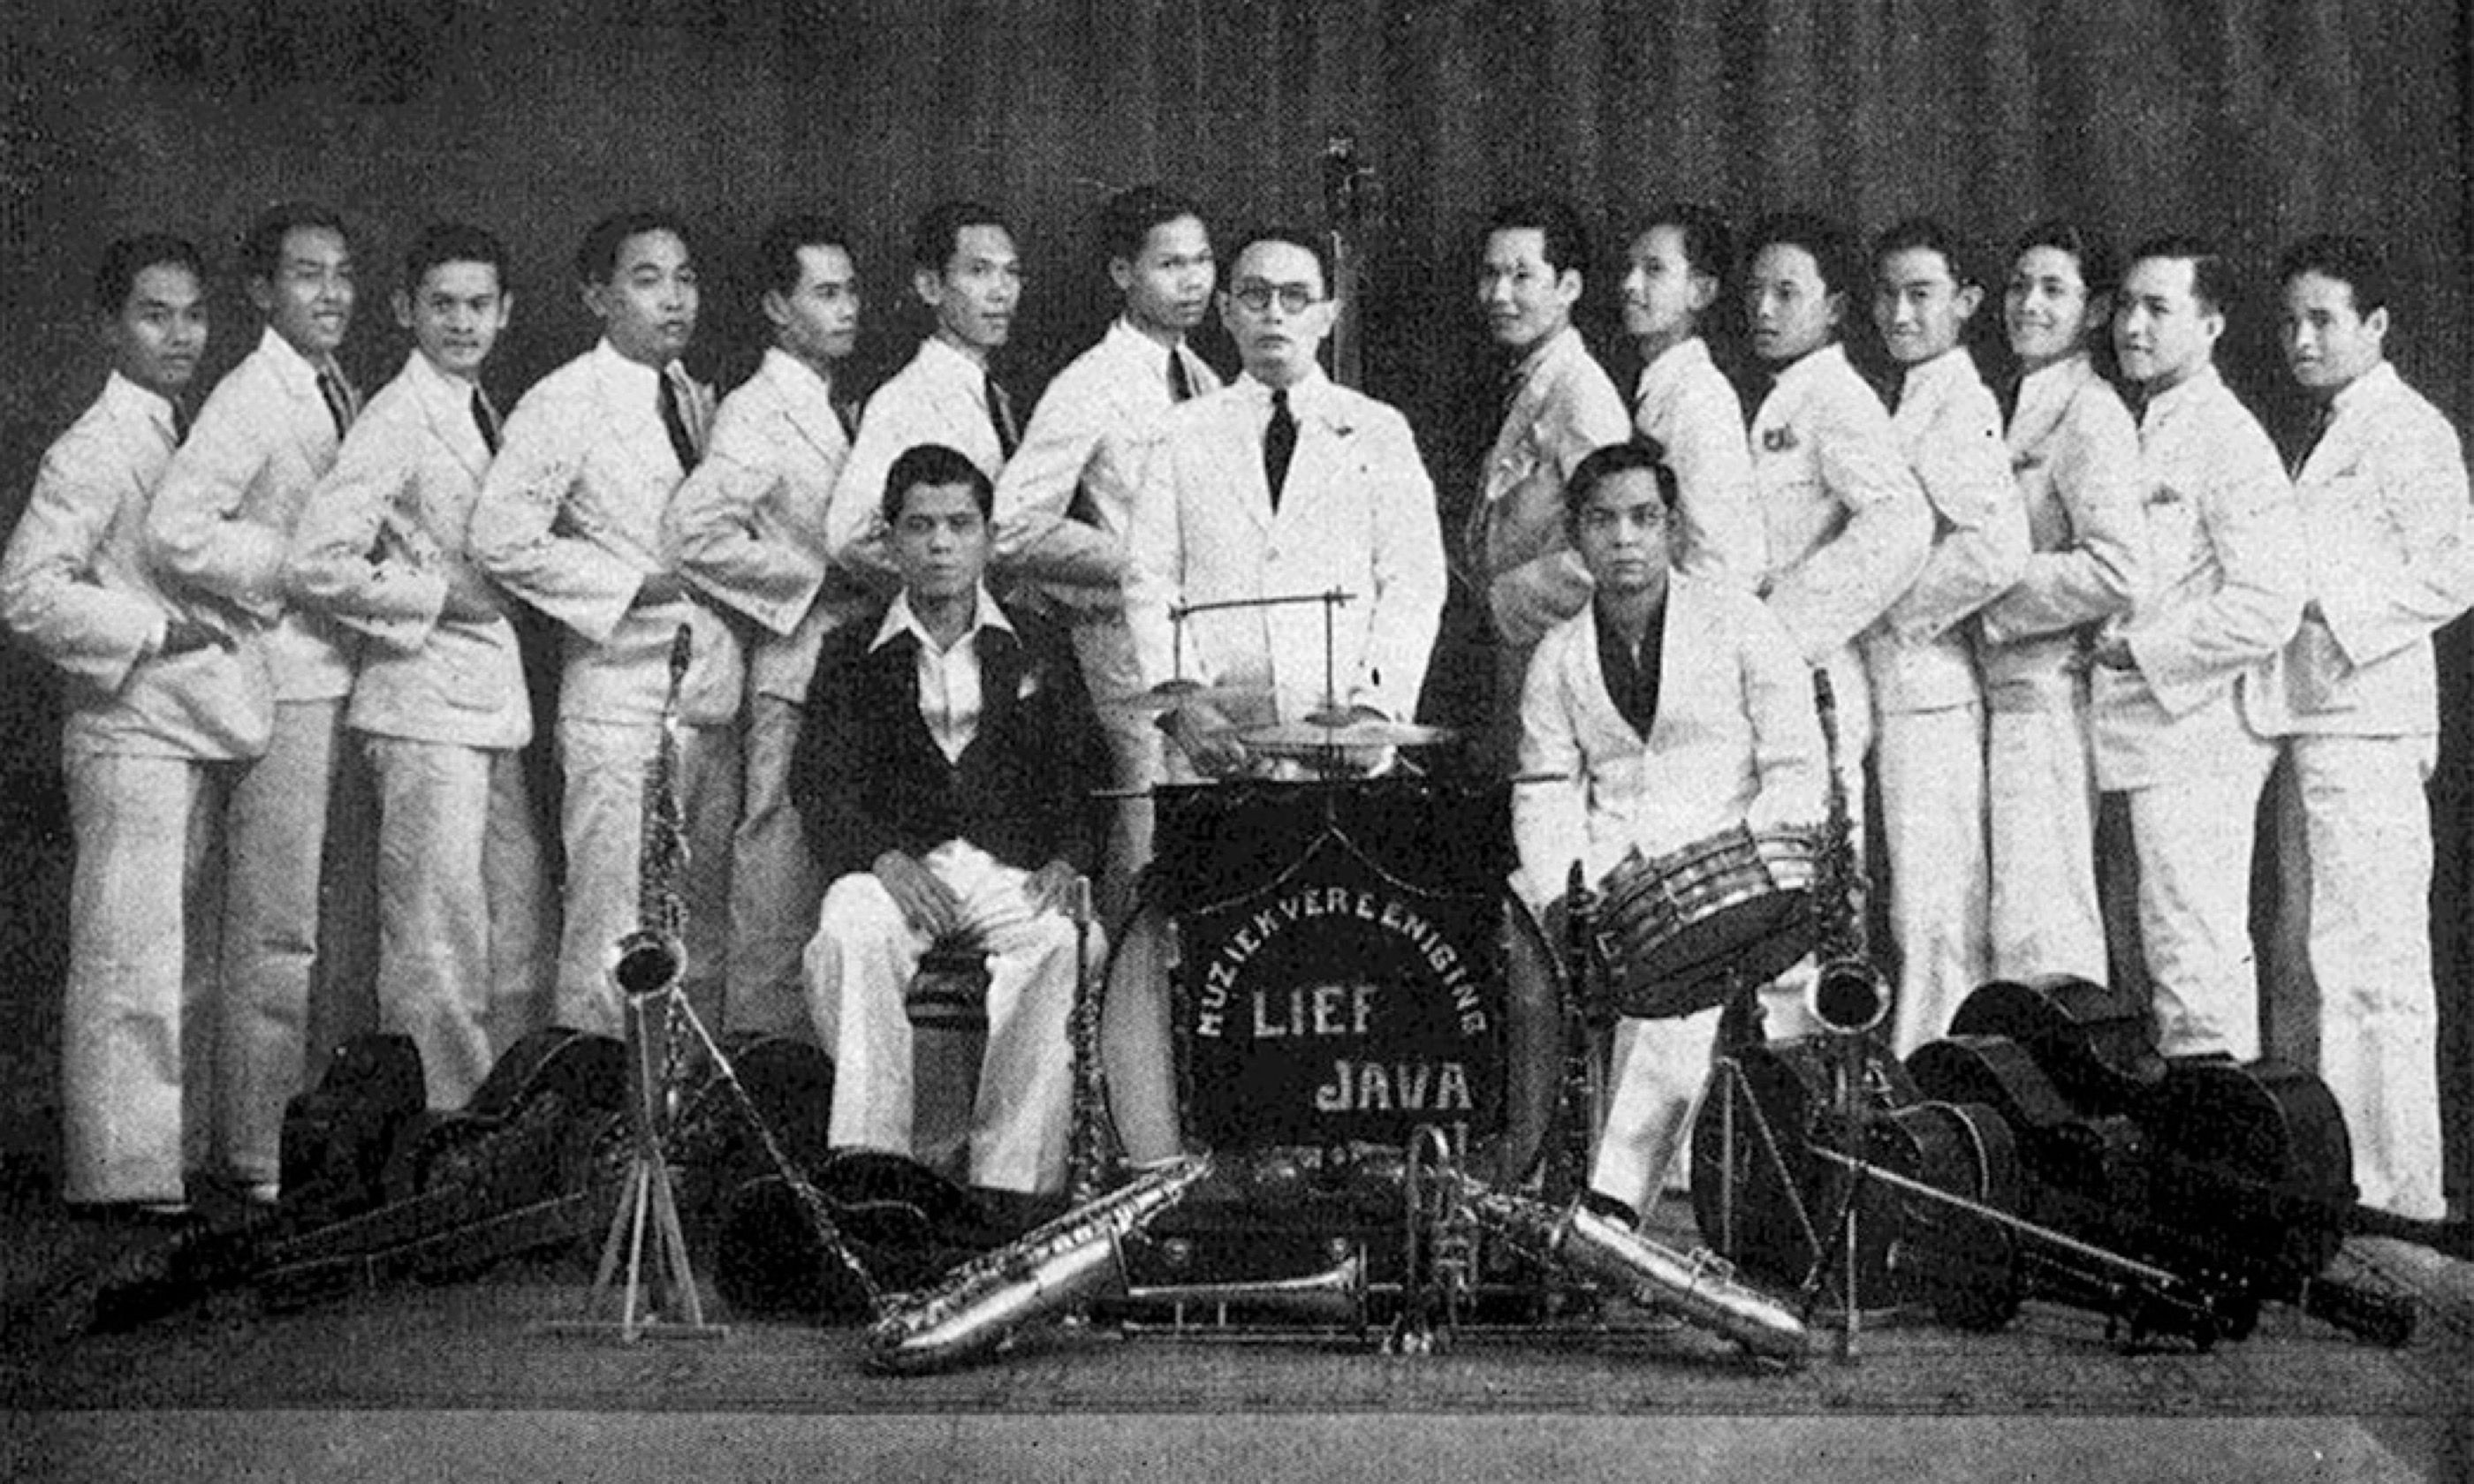 Keronkong Orchestra in Batavia, 1936 (Wiki Imagaes: Public Domain)